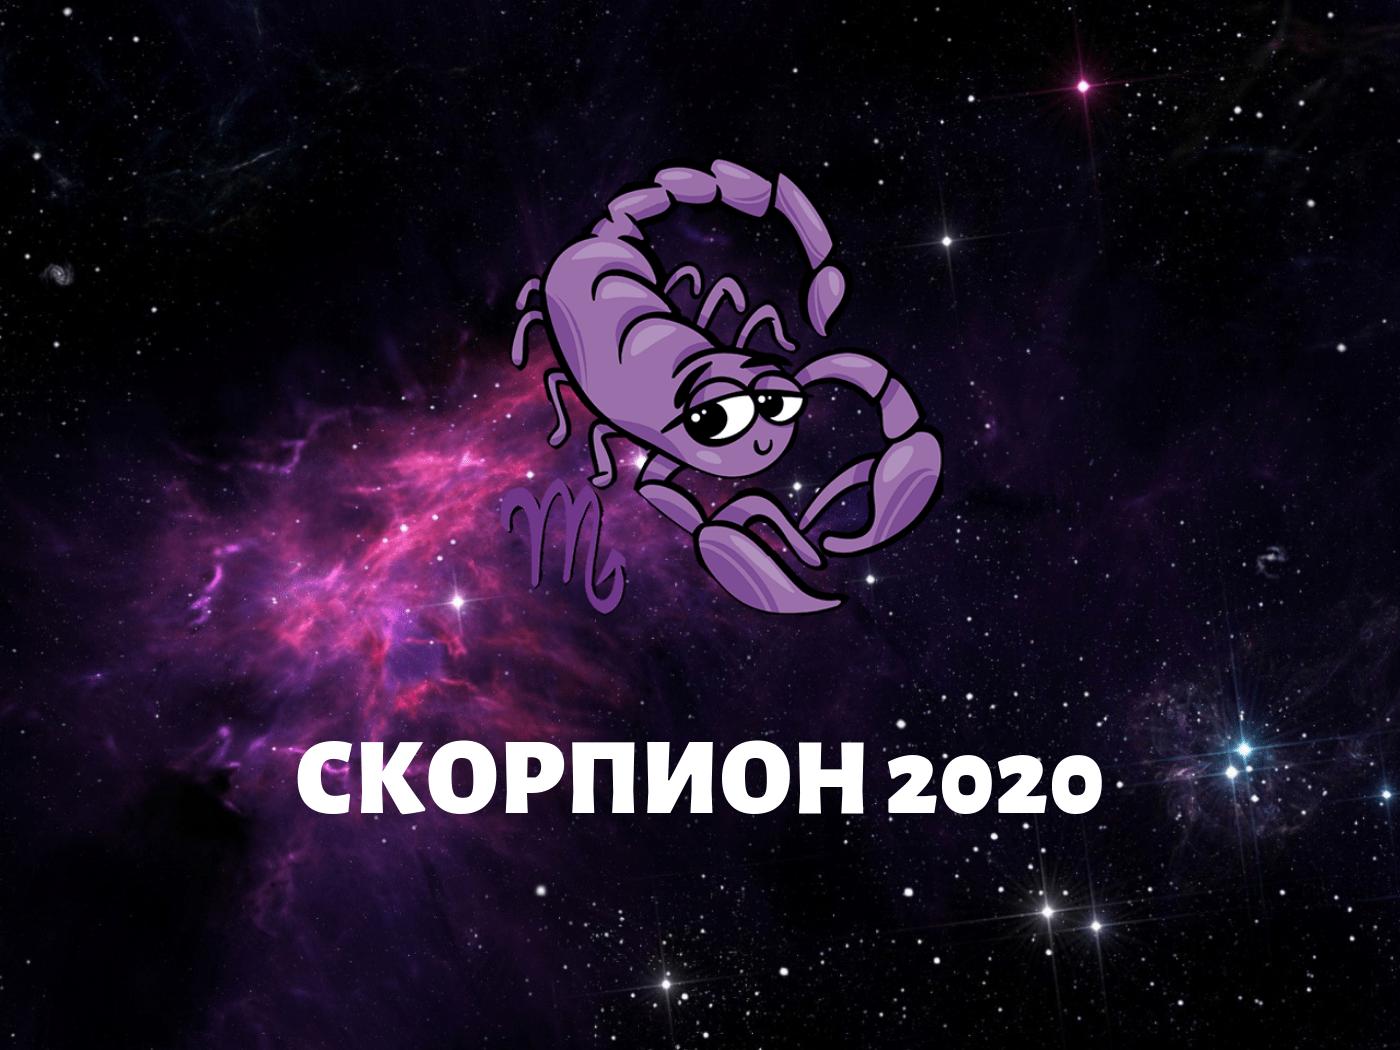 Гороскоп на 2020 год Скорпион